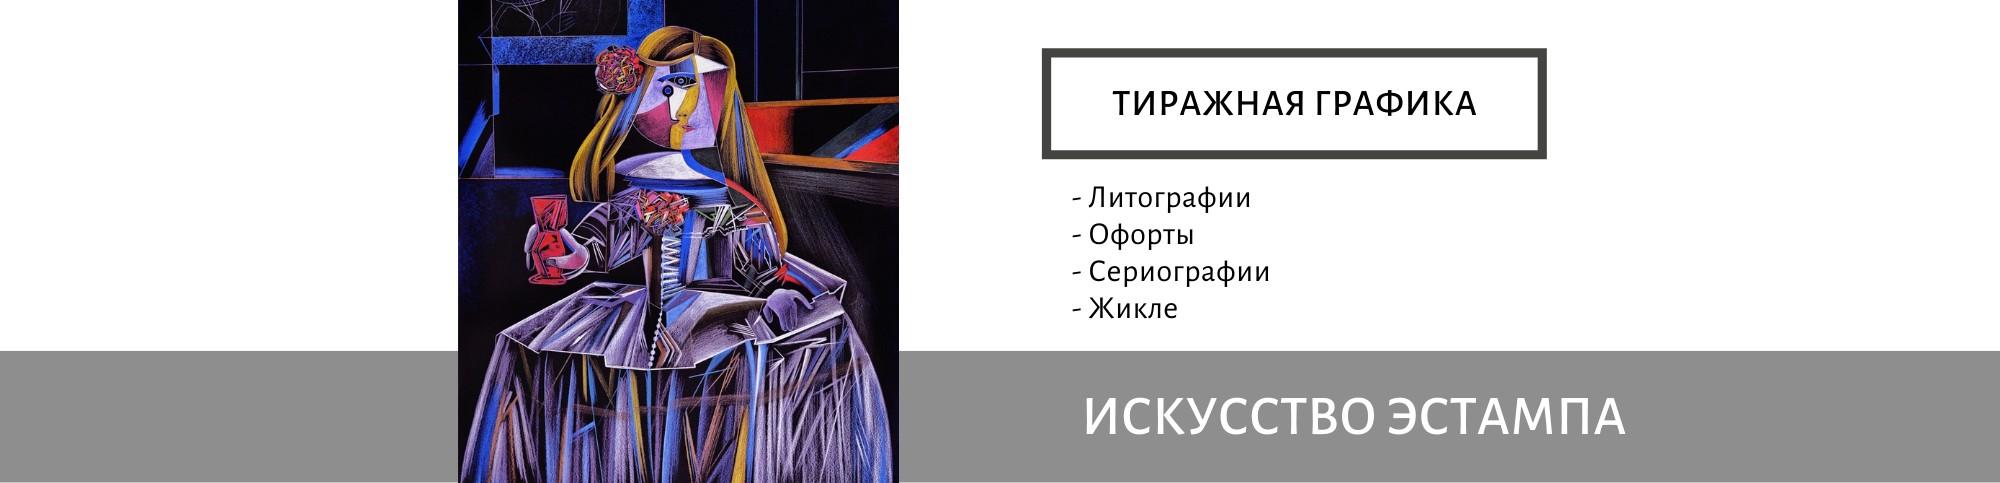 2-circulation-graphics